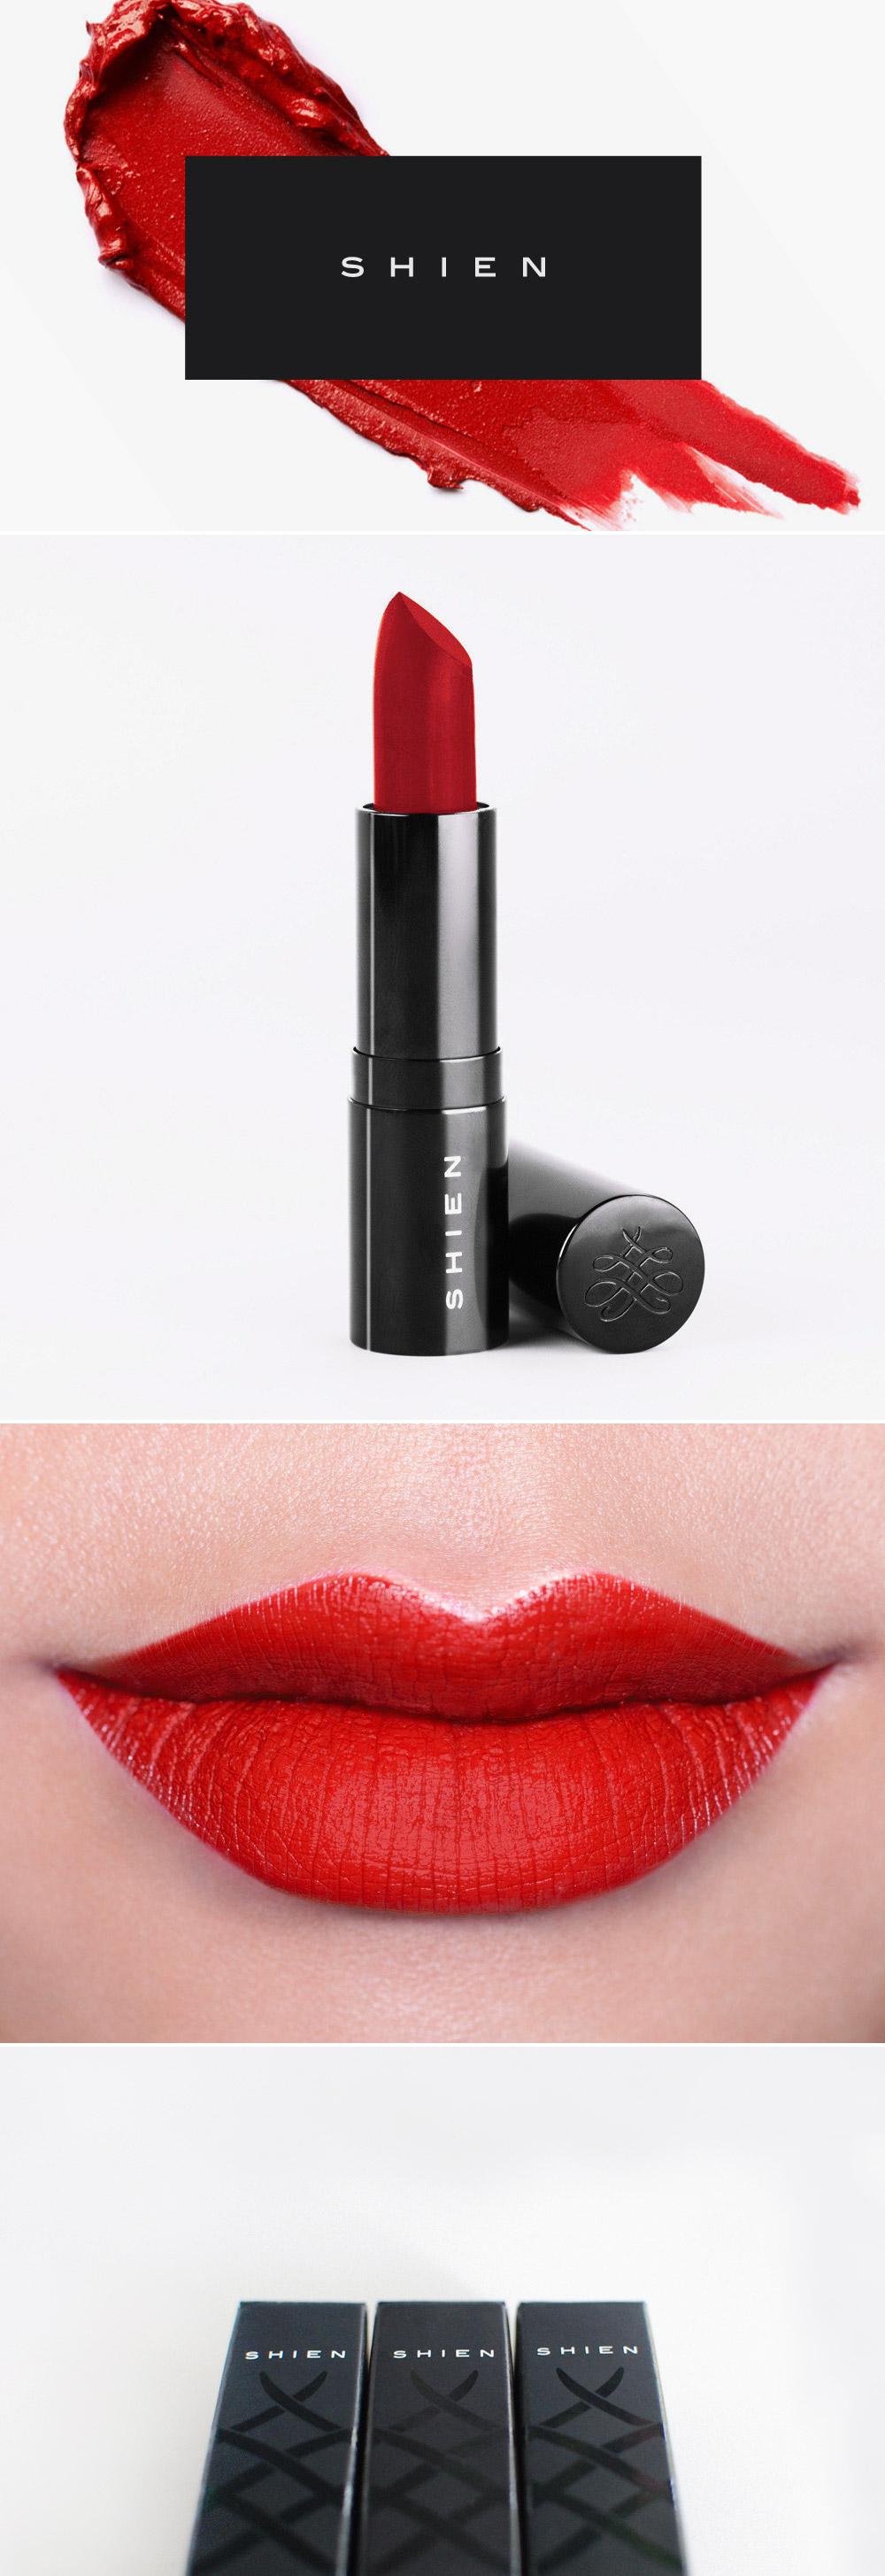 We Are Branch | Shien Lee Cosmetics